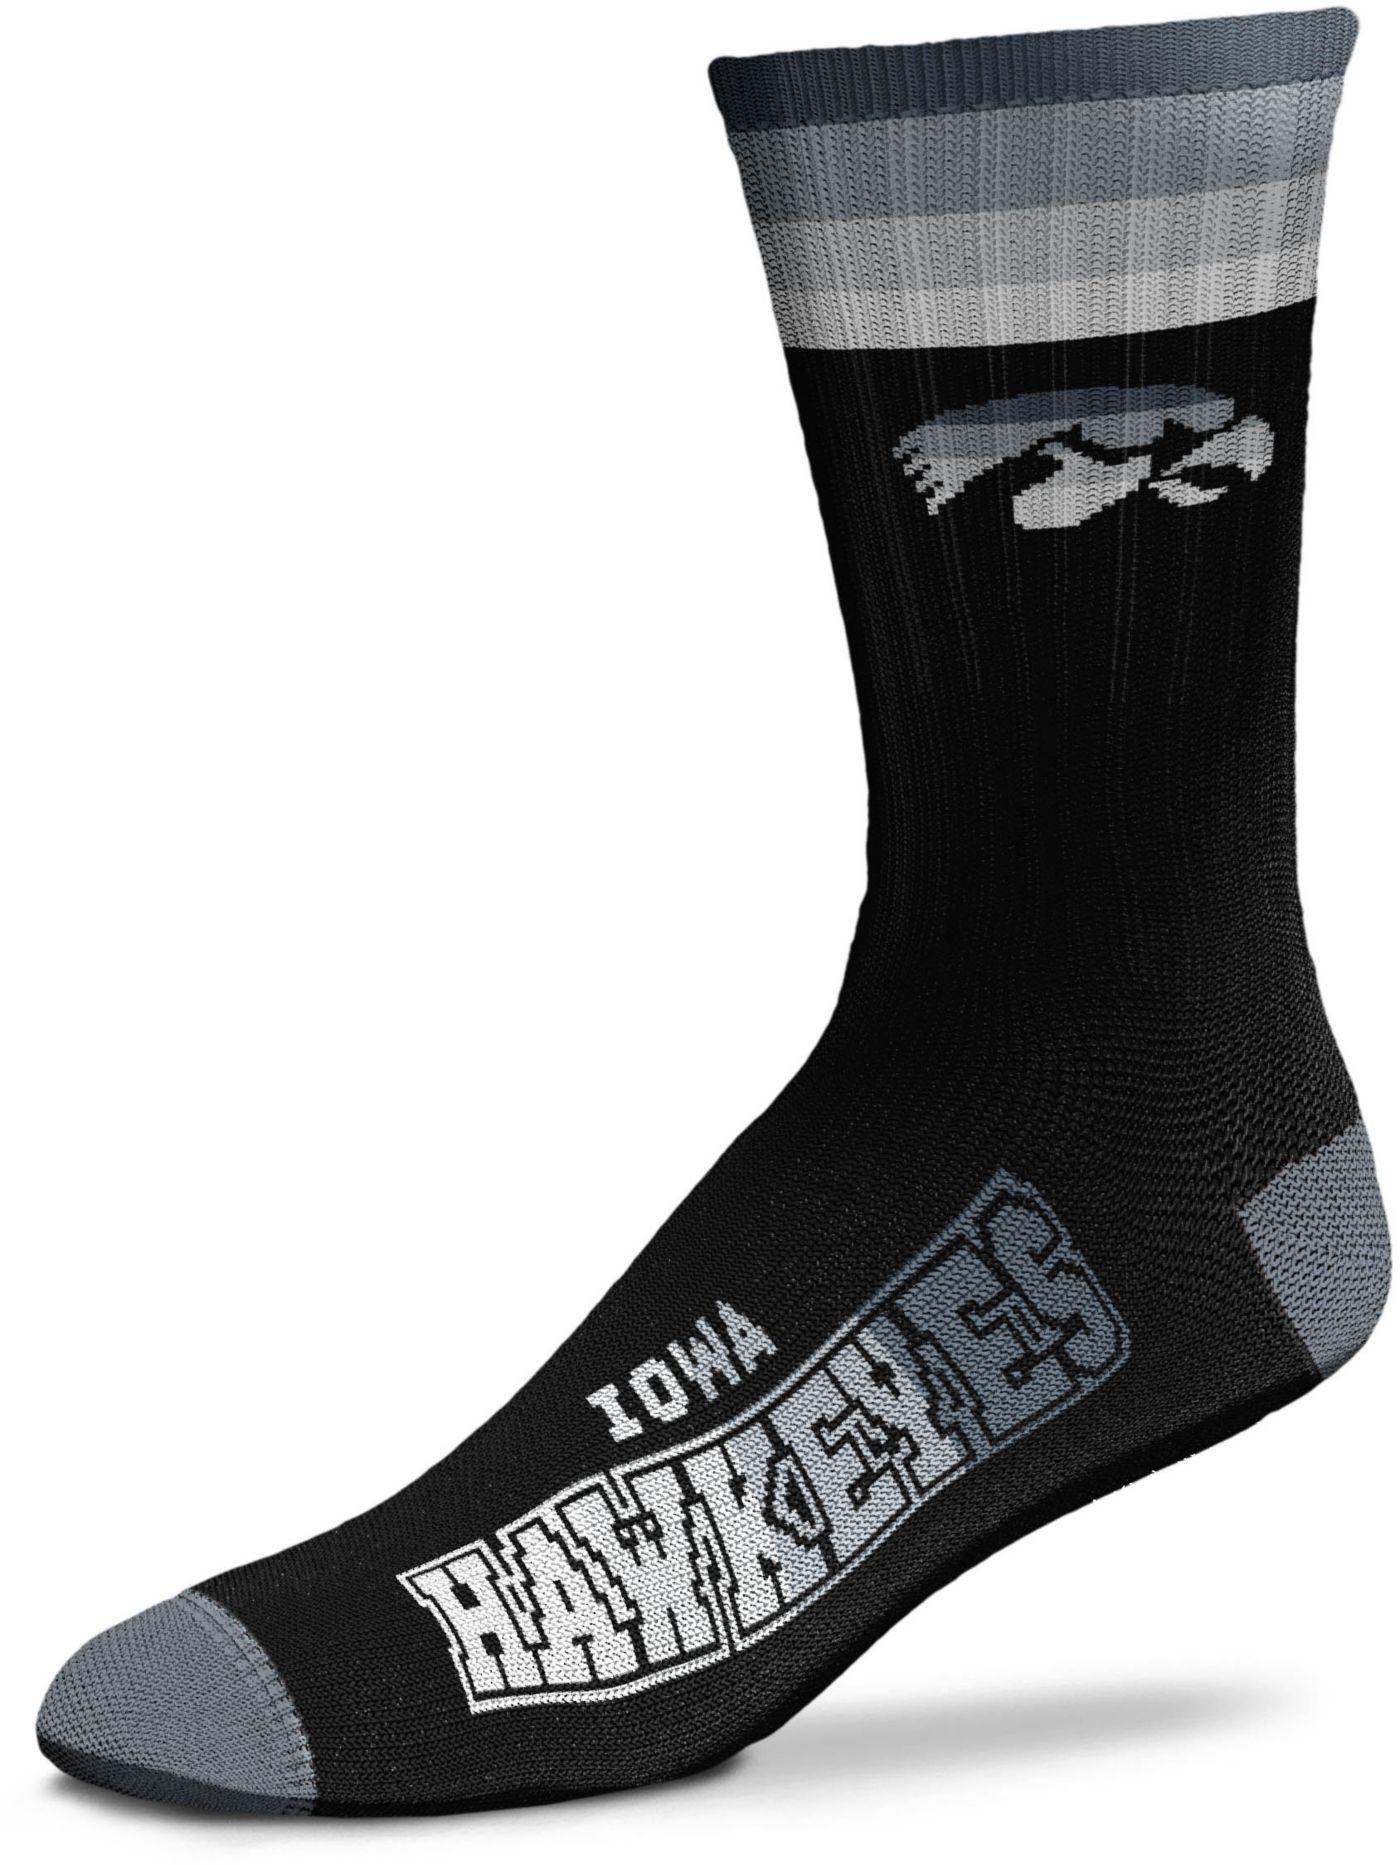 For Bare Feet Iowa Hawkeyes Platinum Crew Socks